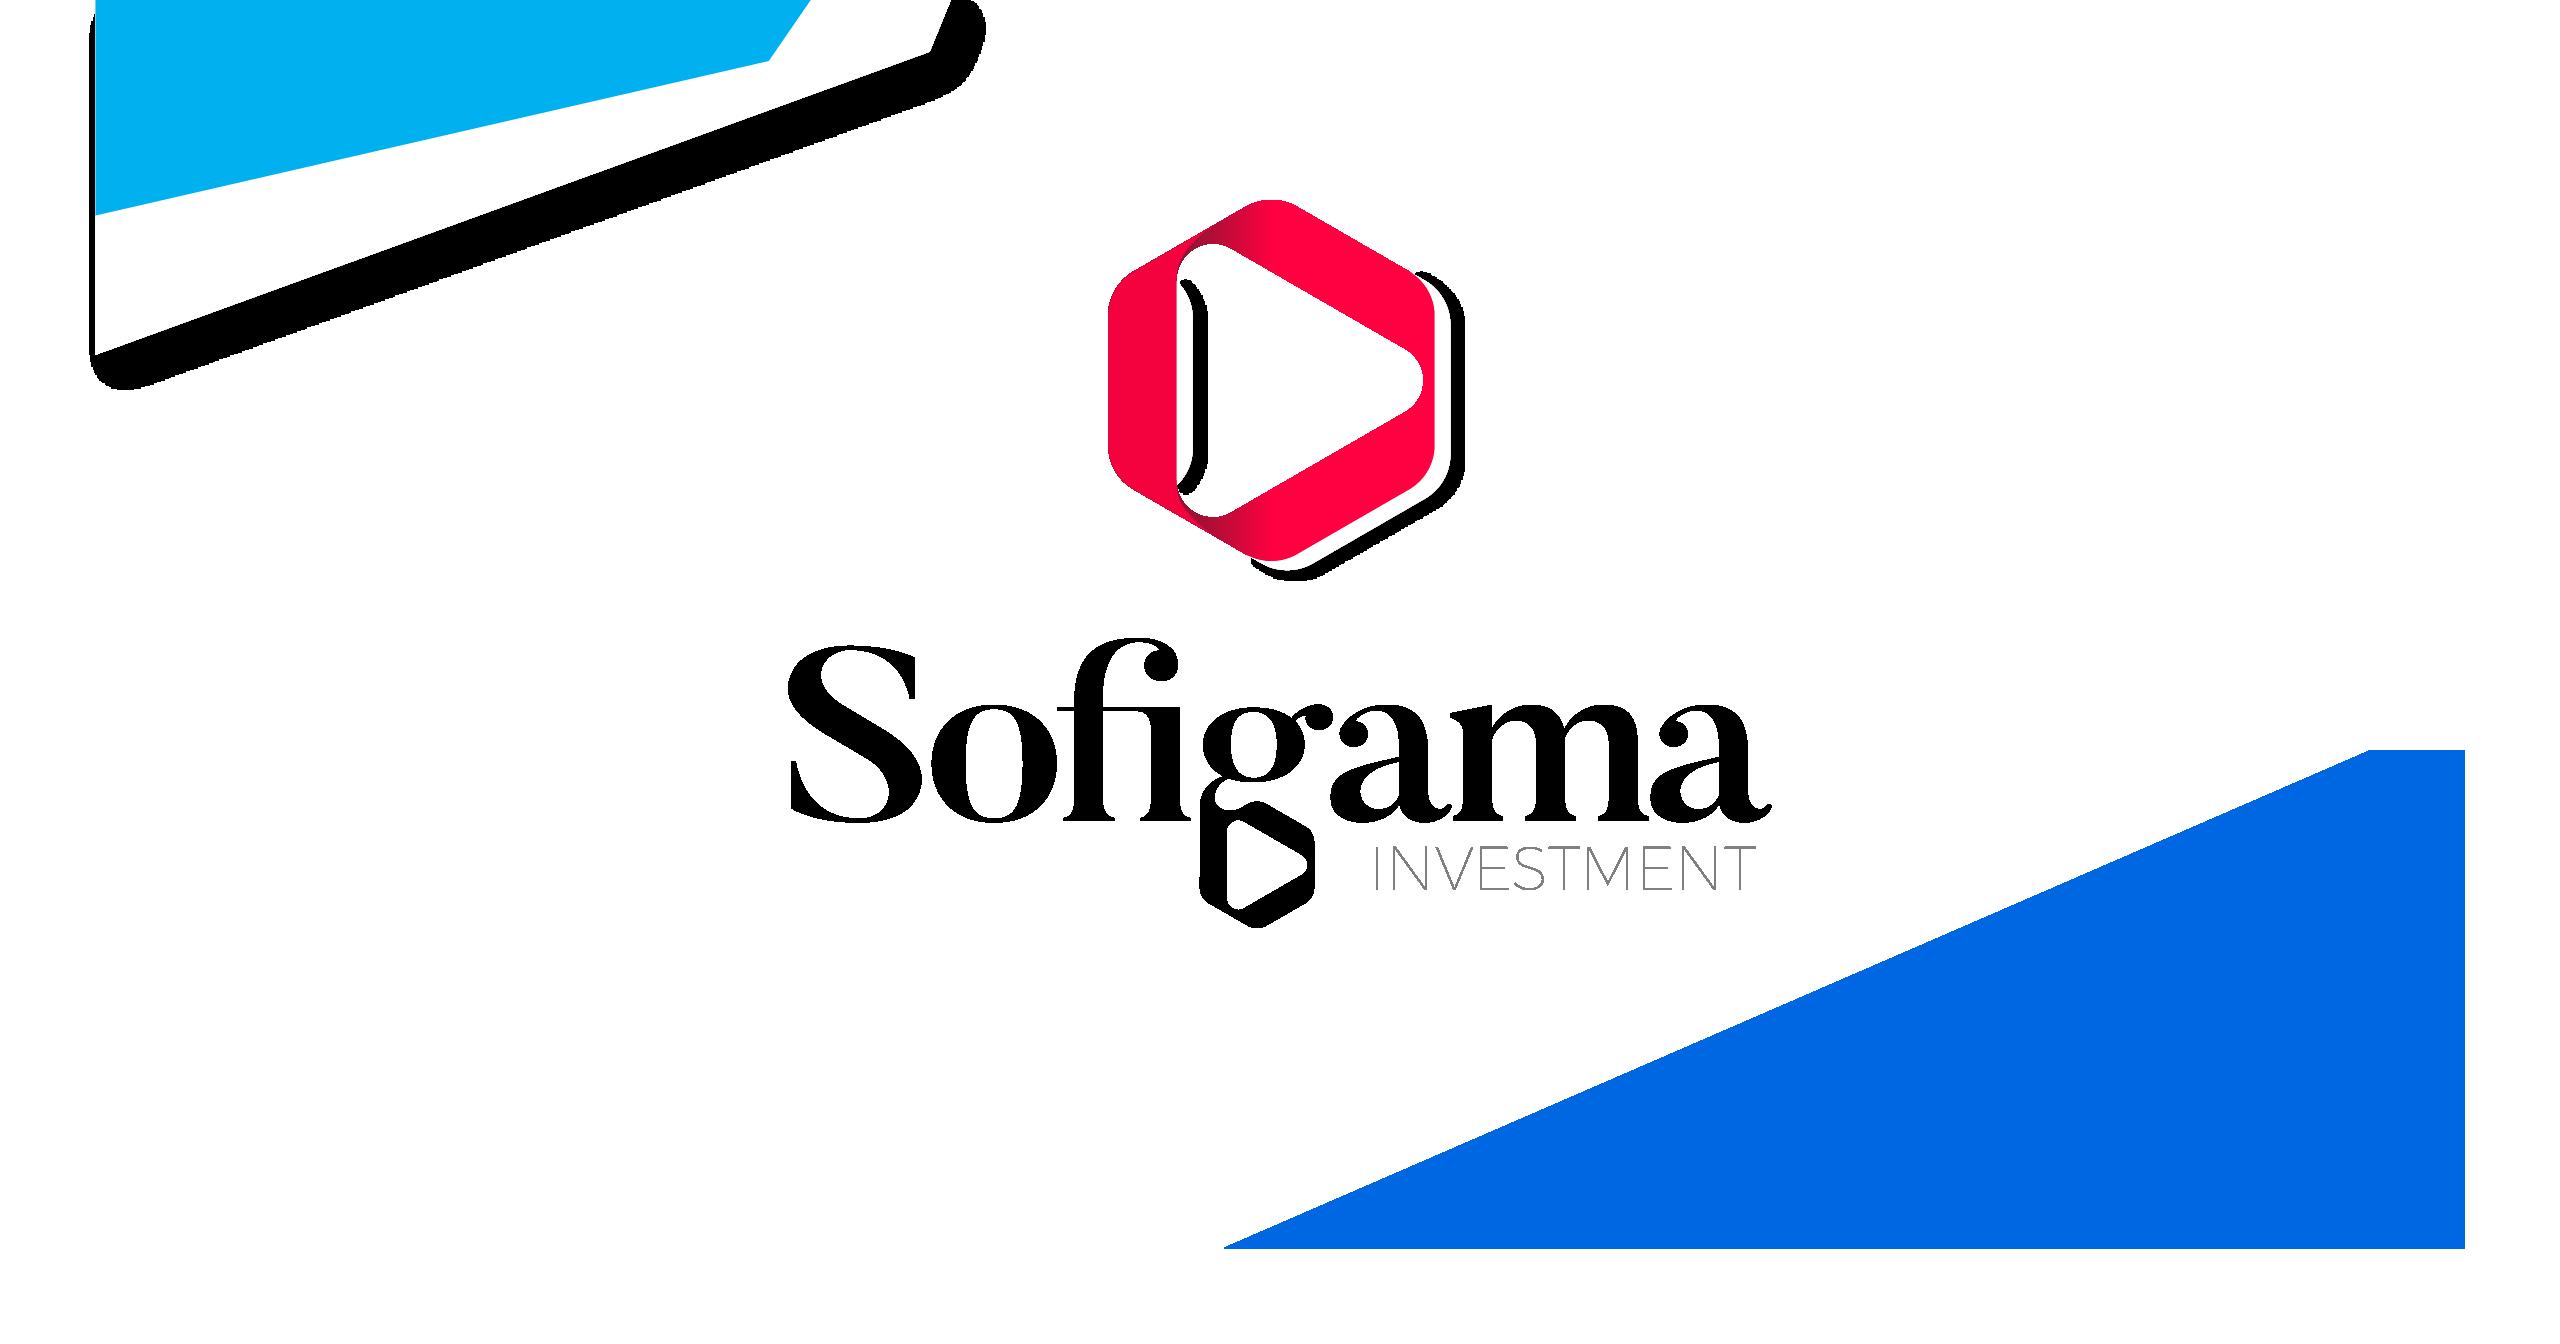 SOFIGAMA Logo Logobou Design 1